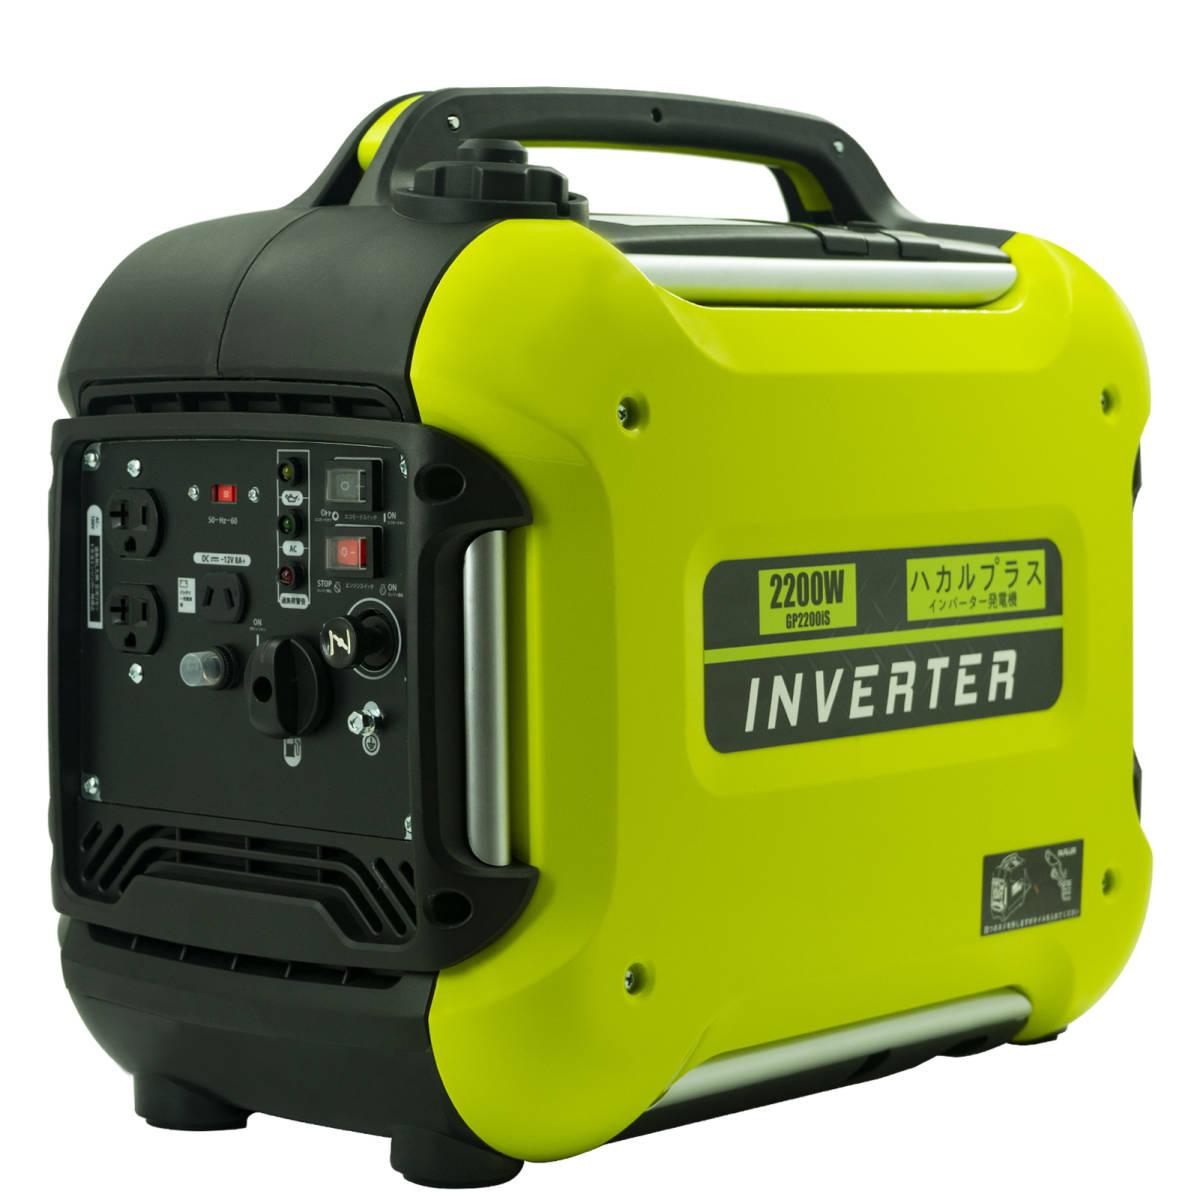 2200VAインバーター発電機 ガソリン発電機 静音55dBA 小型家用発電機 正弦波 地震 災害 停電 家庭用 東/西日本地域に適用